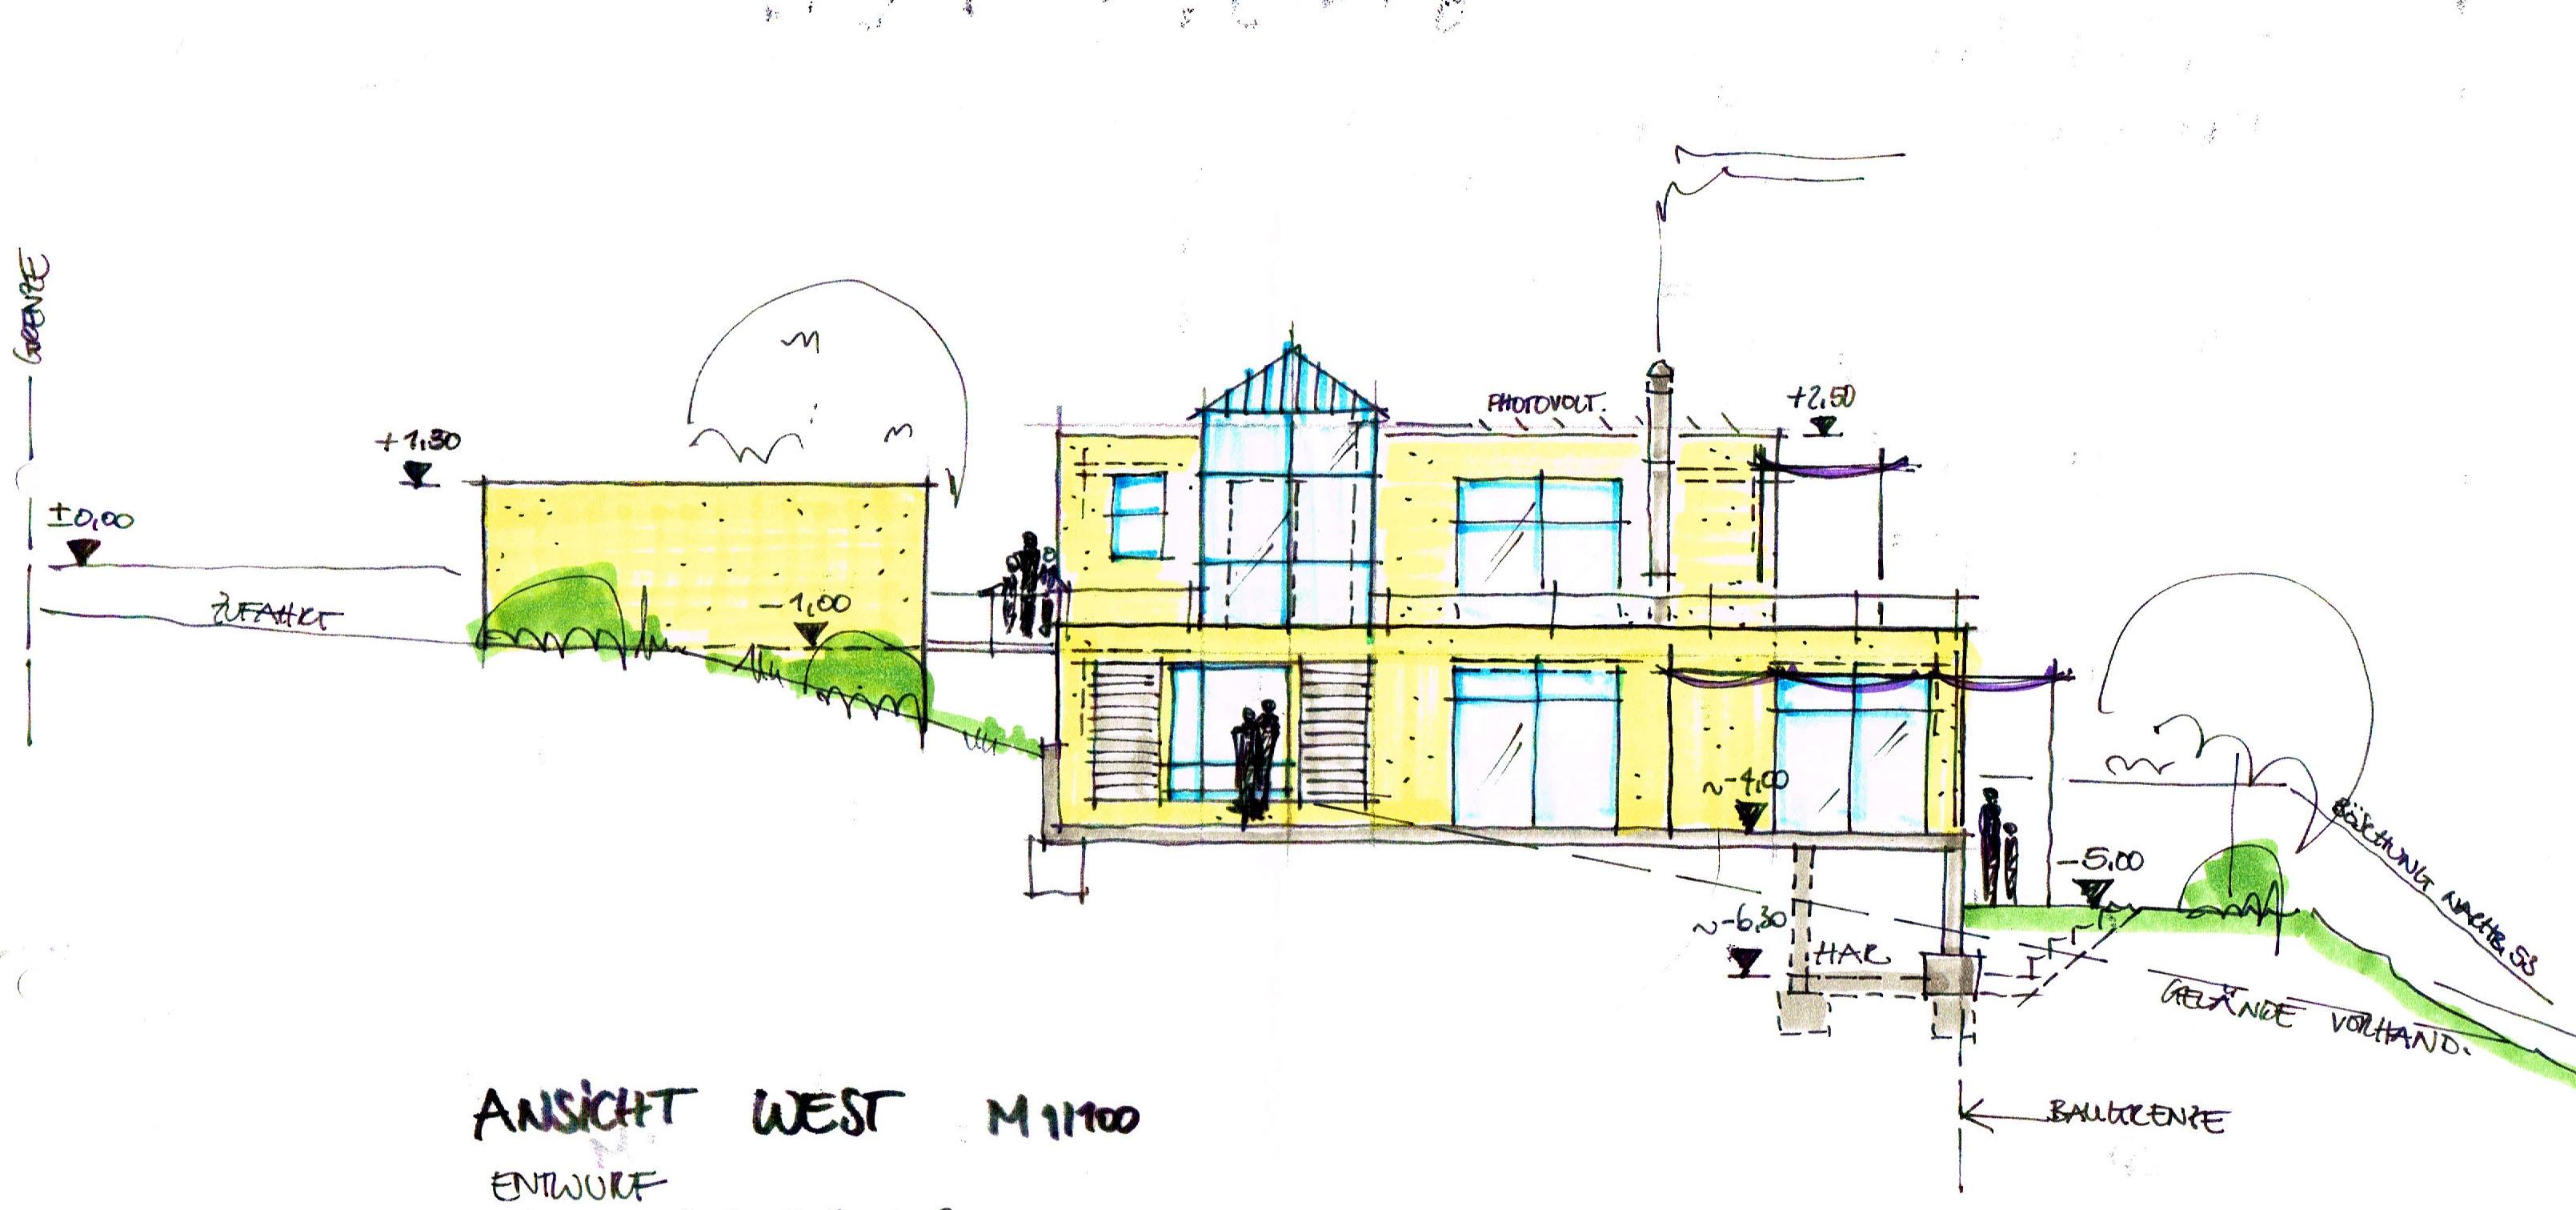 feng shui haus planen. Black Bedroom Furniture Sets. Home Design Ideas